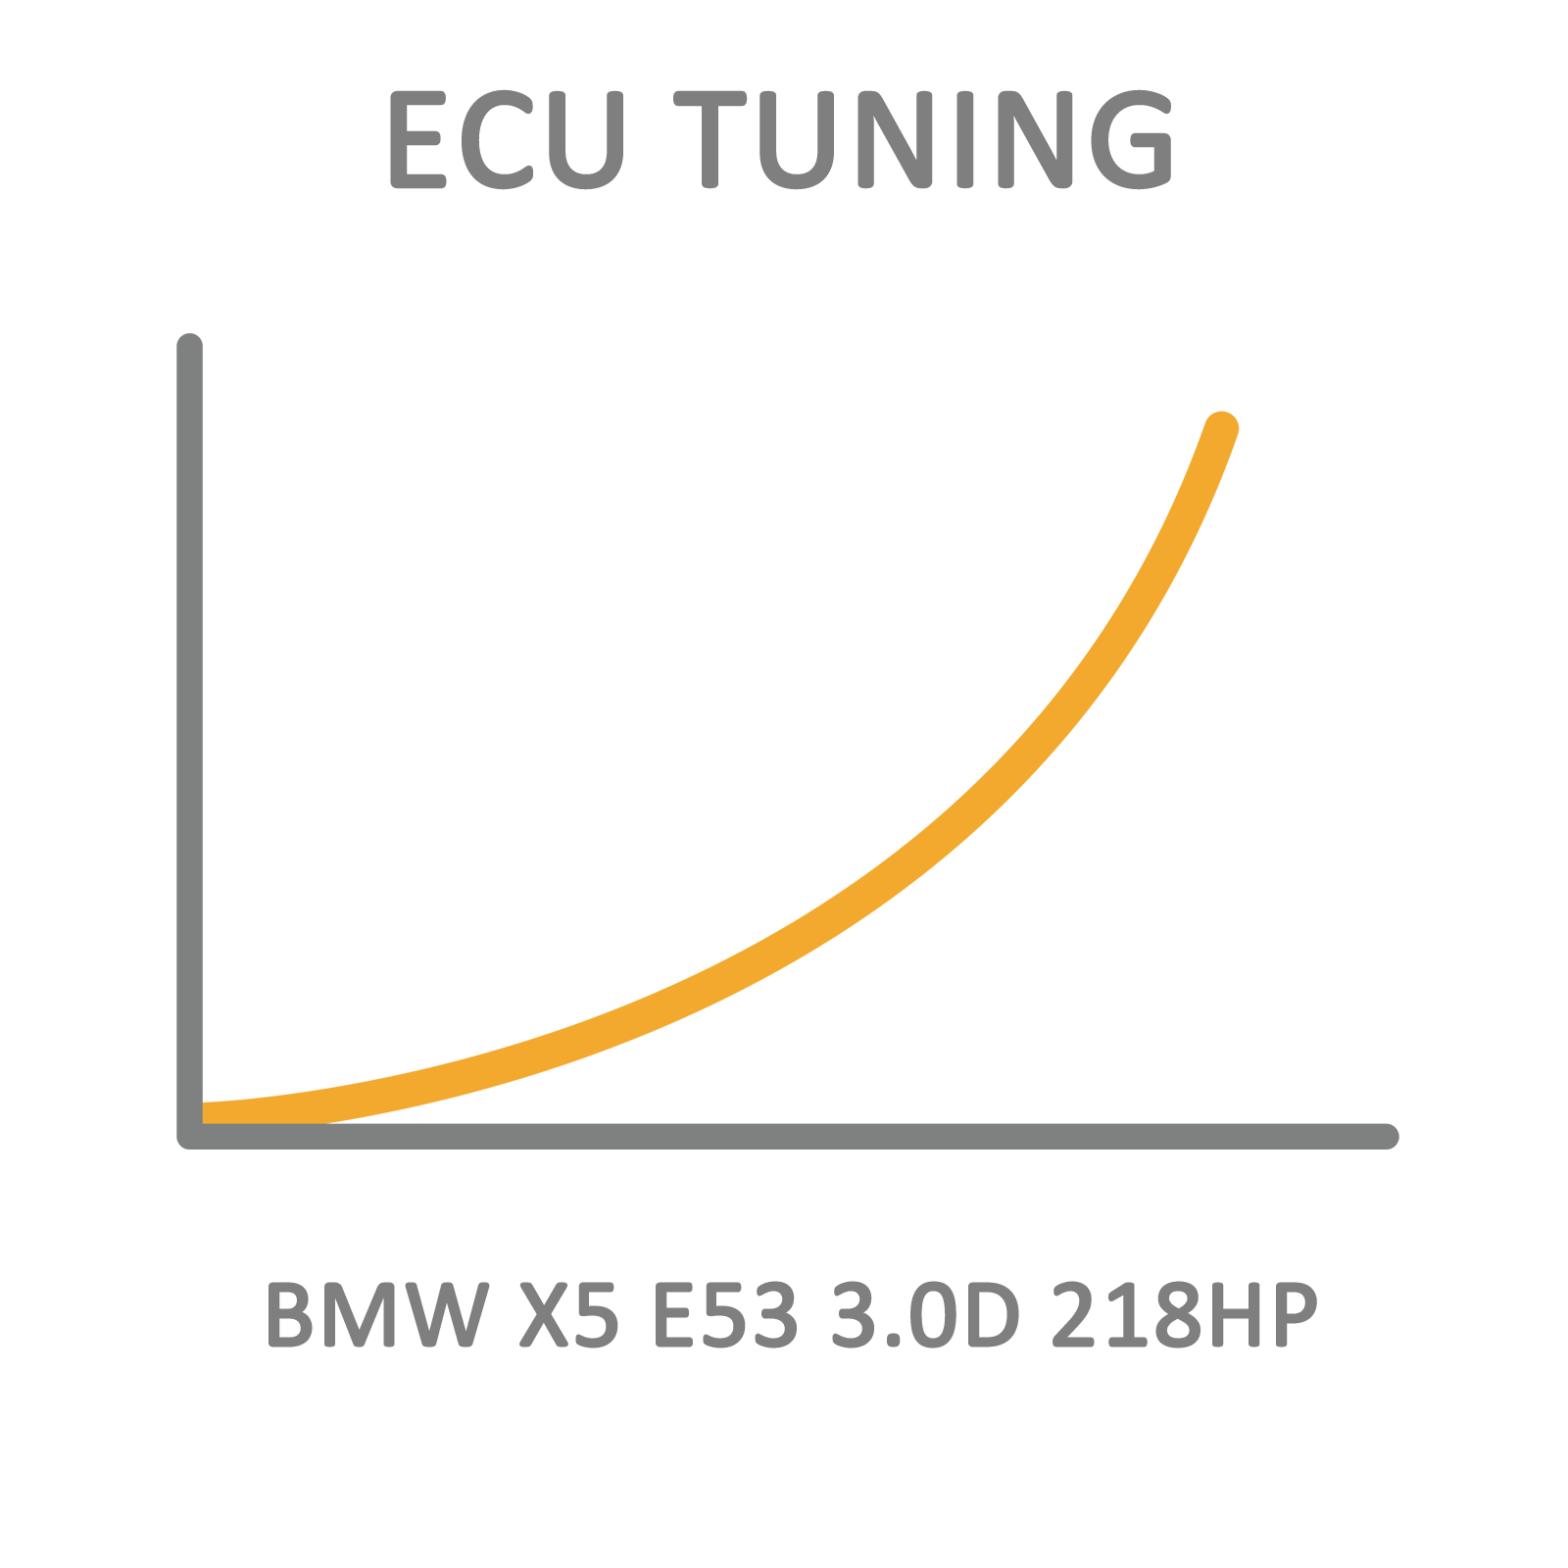 BMW X5 E53 3.0D 218HP ECU Tuning Remapping Programming